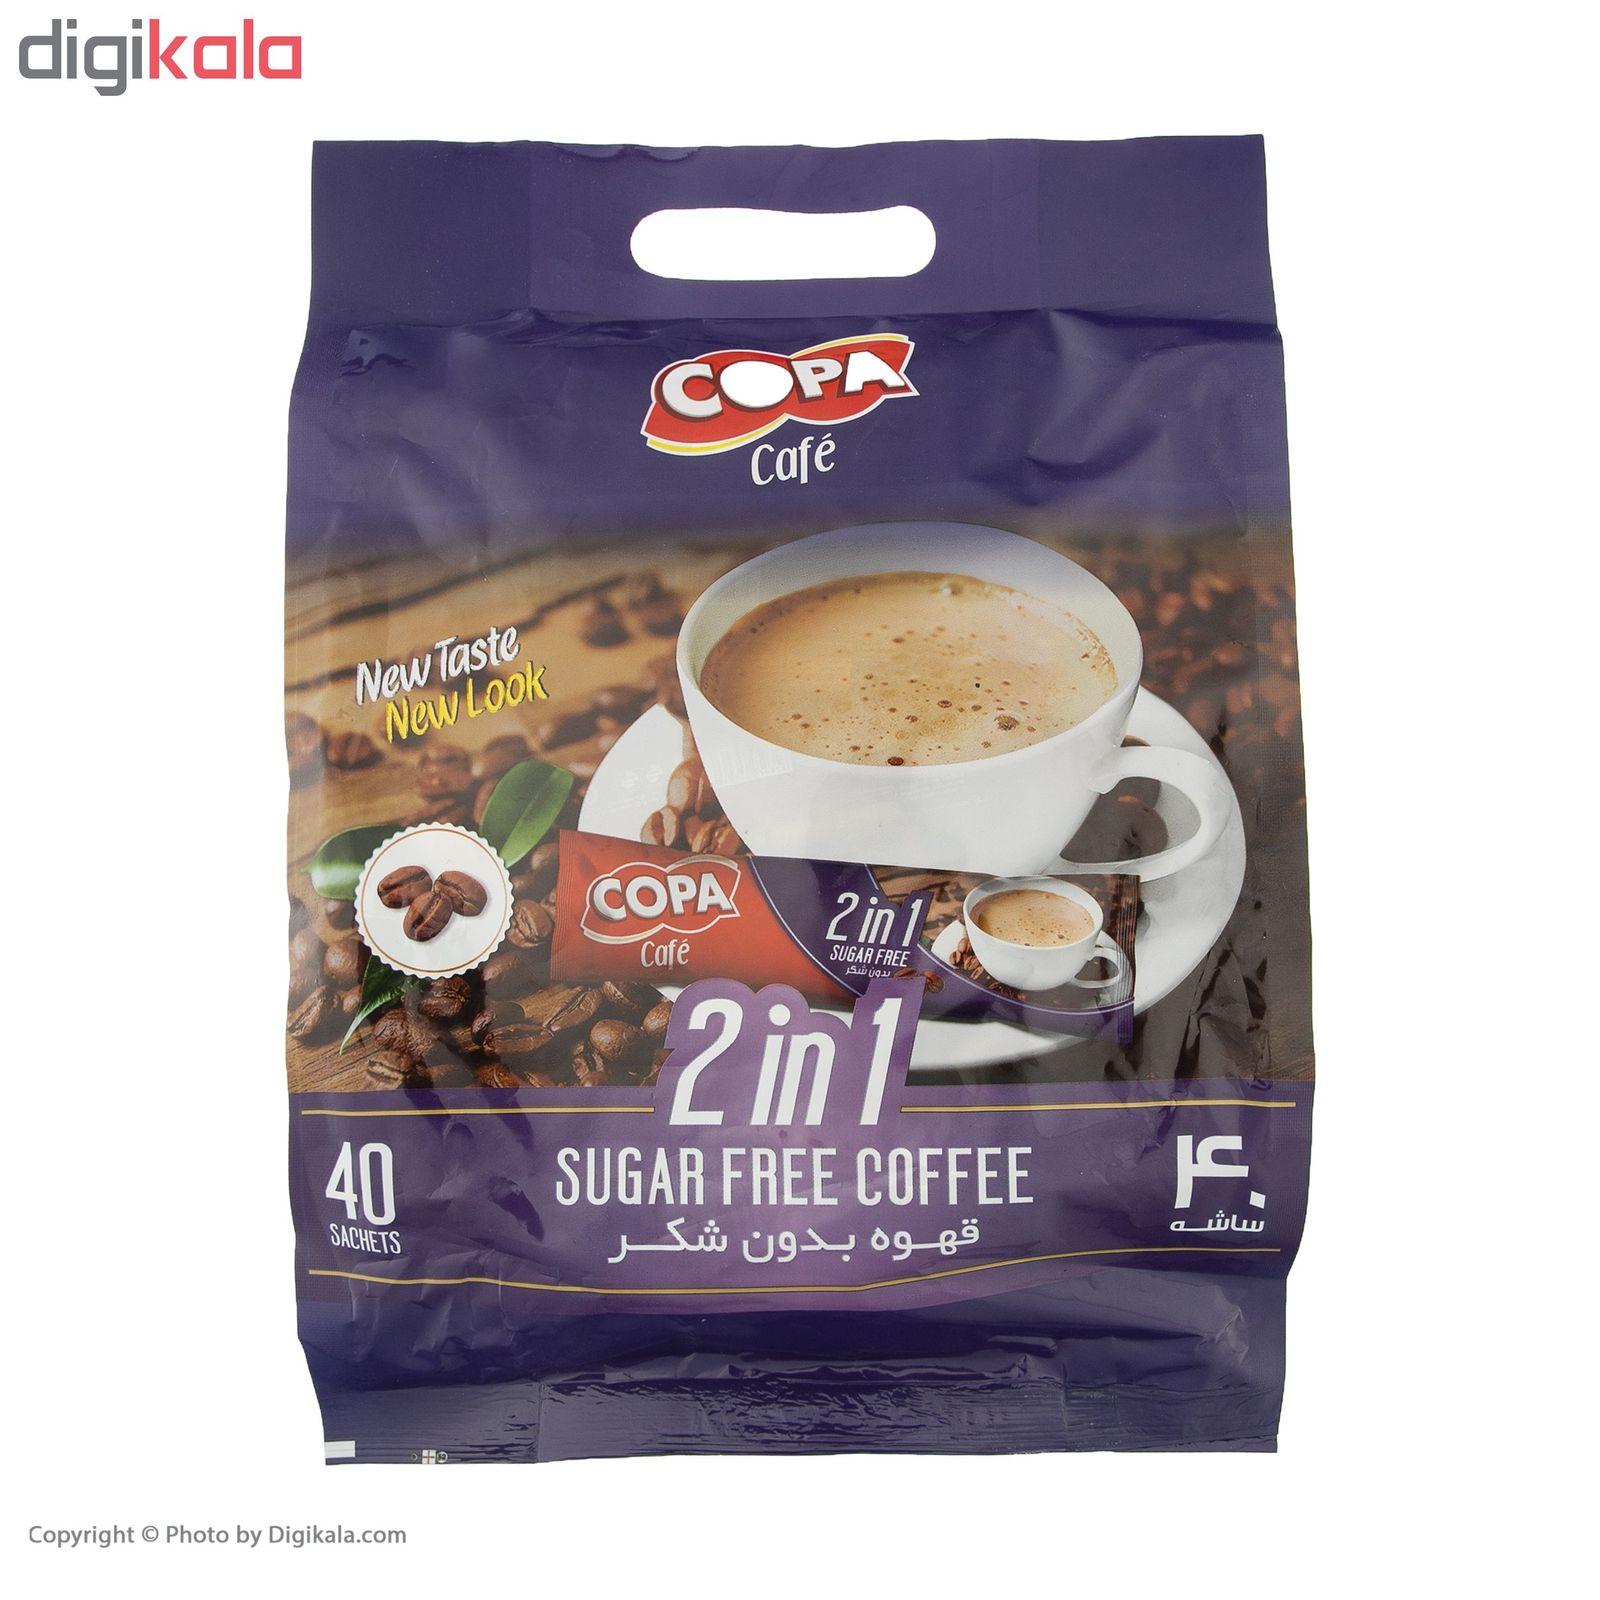 قهوه بدون شکر کوپا مدل 2in1 بسته 40 عددی main 1 1